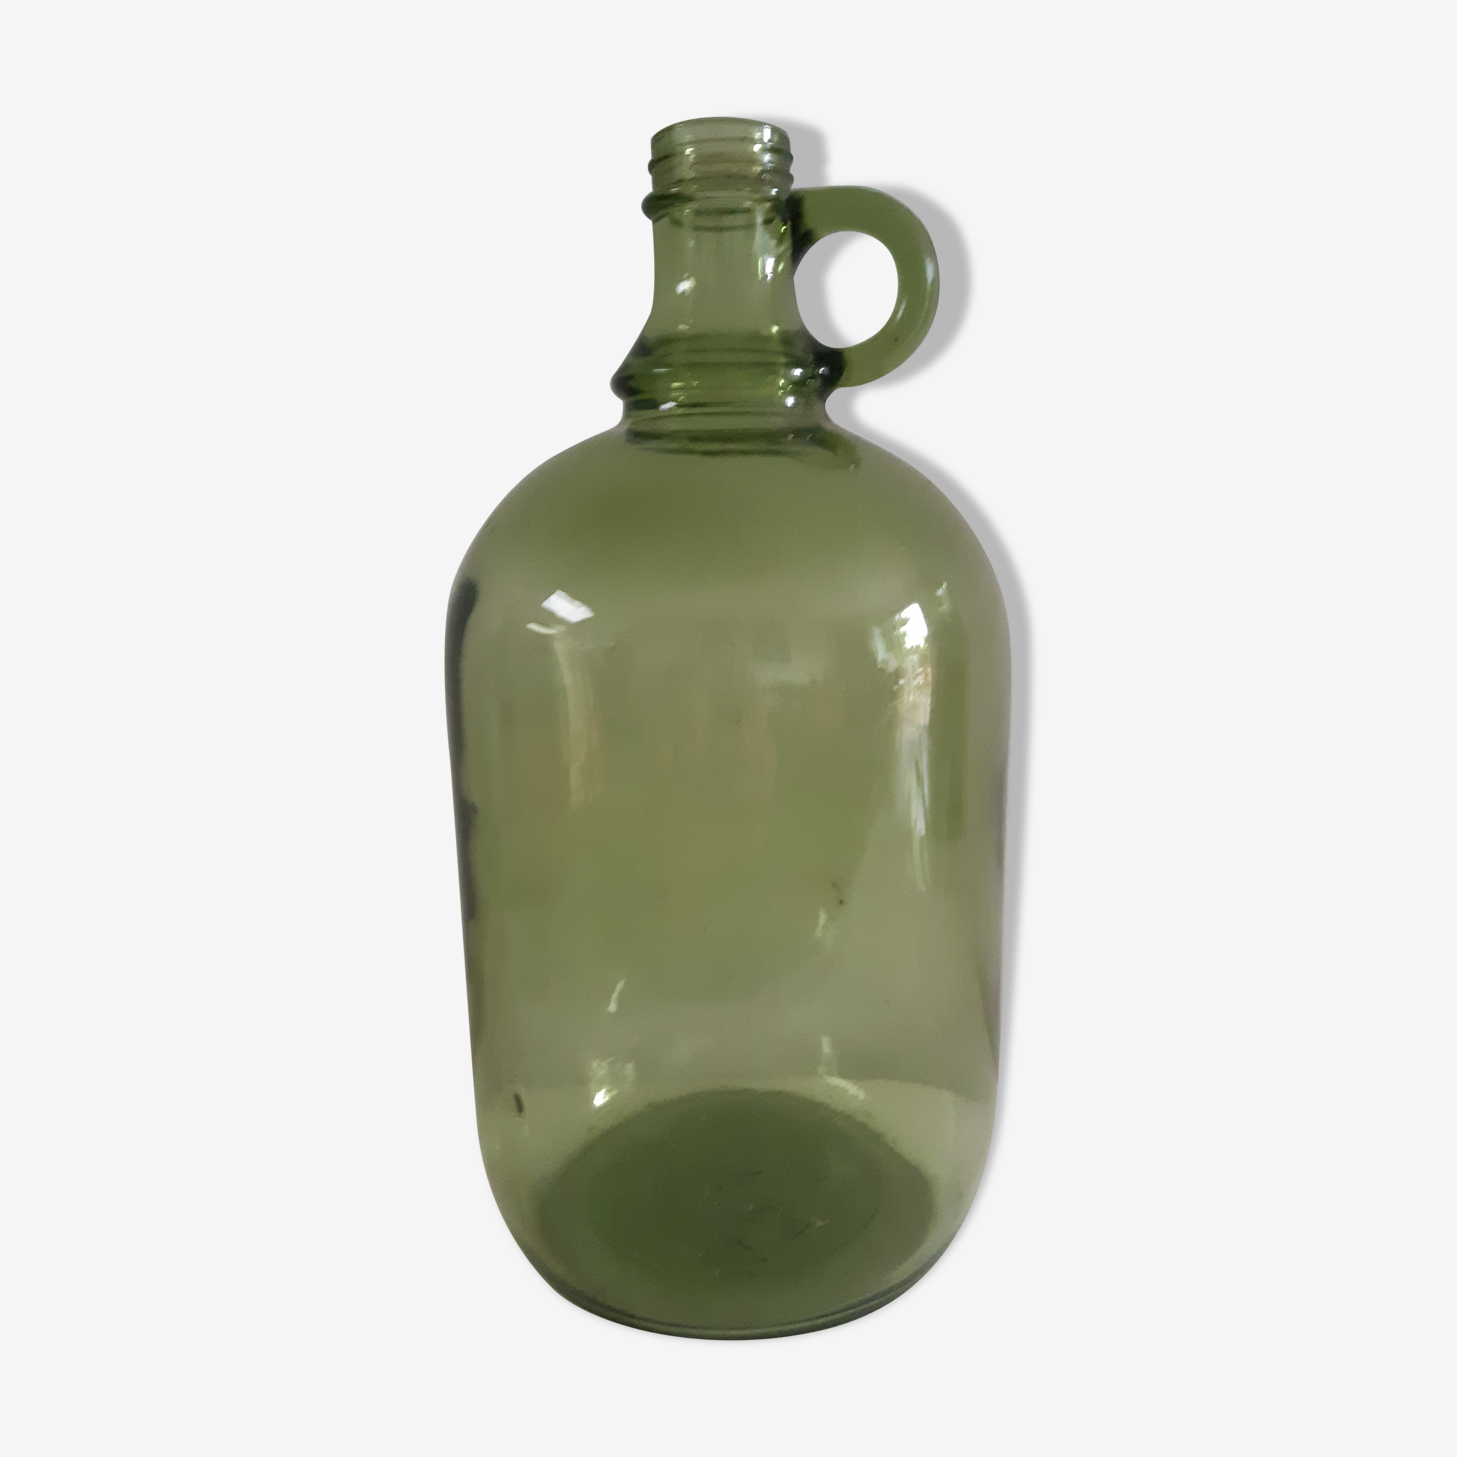 Green demijohn